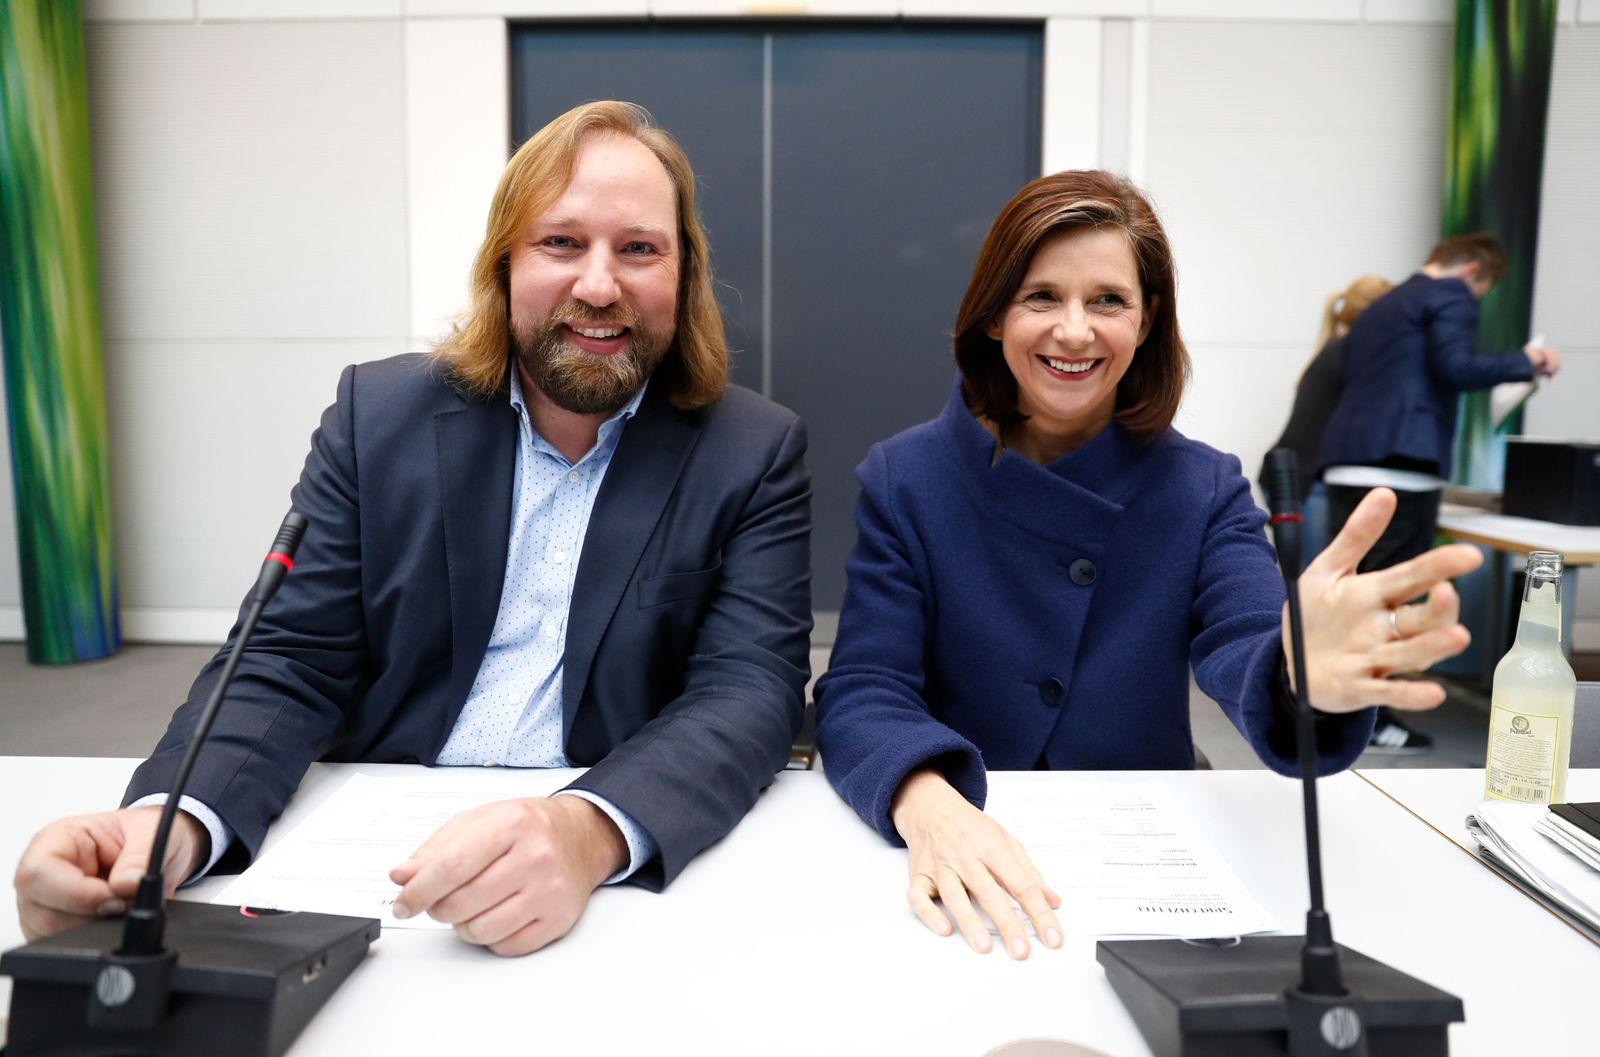 GERMANY-POLITICS-PARTY-GREENS